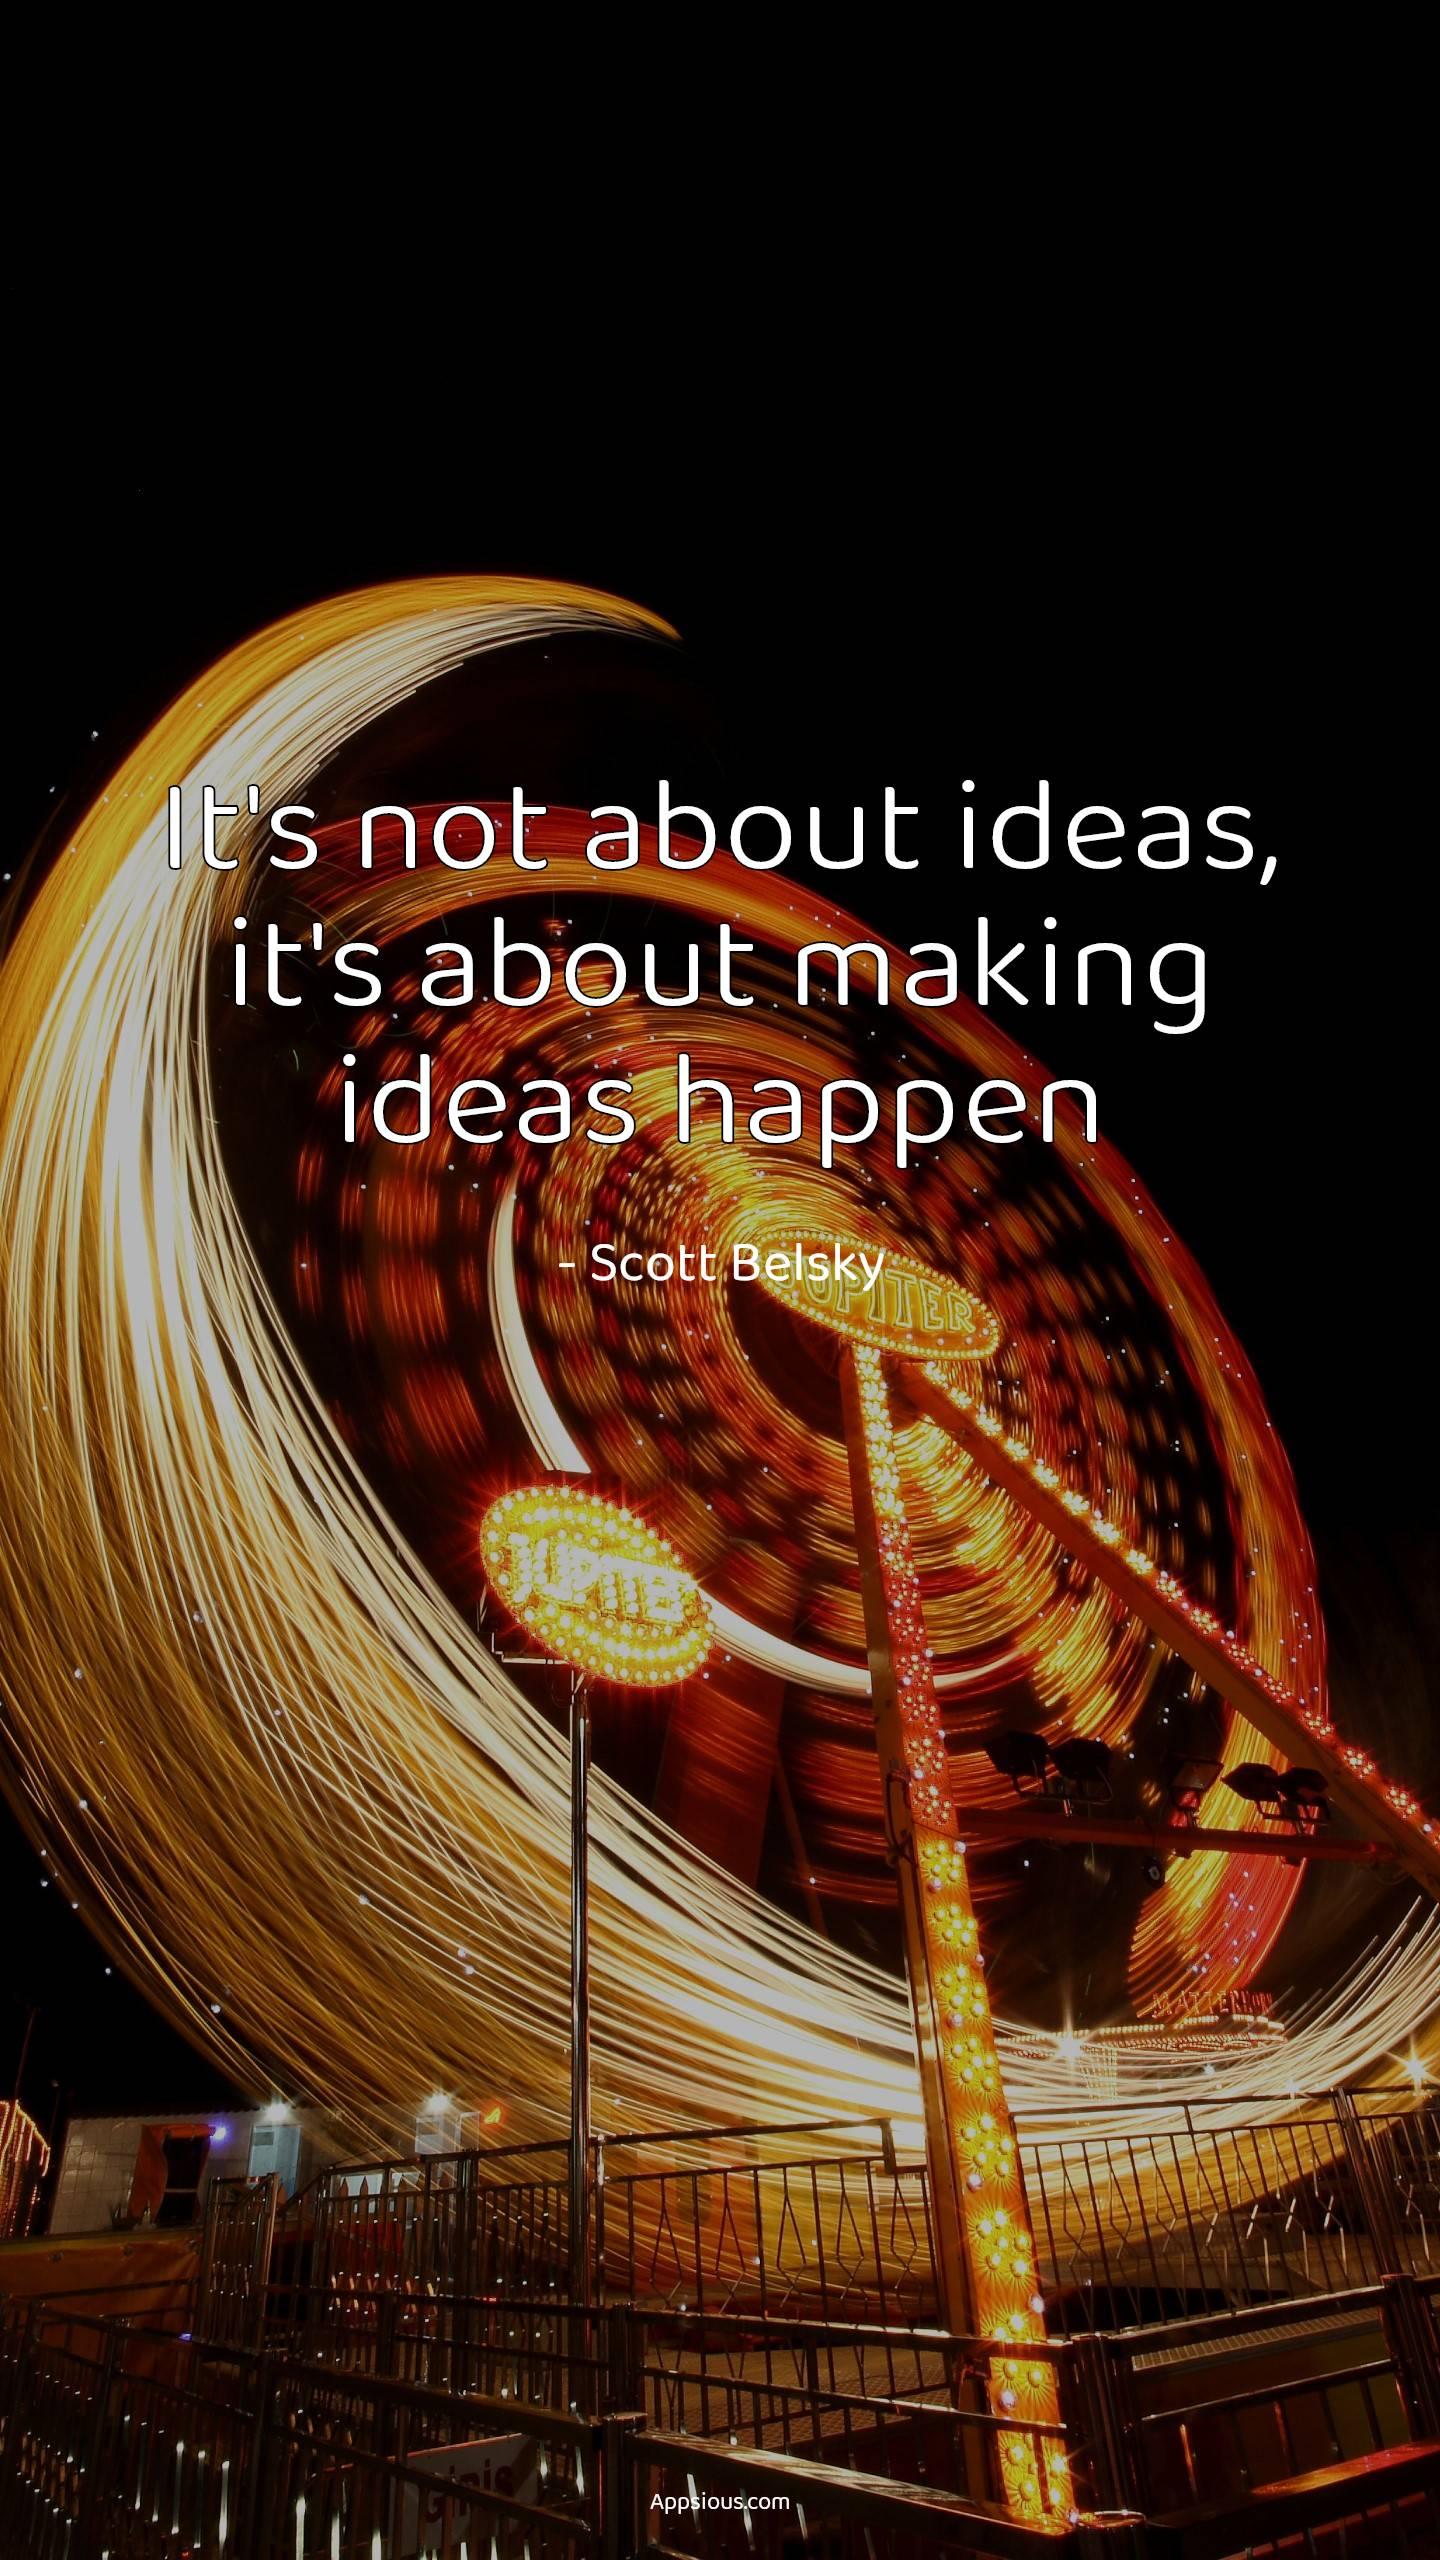 It's not about ideas, it's about making ideas happen